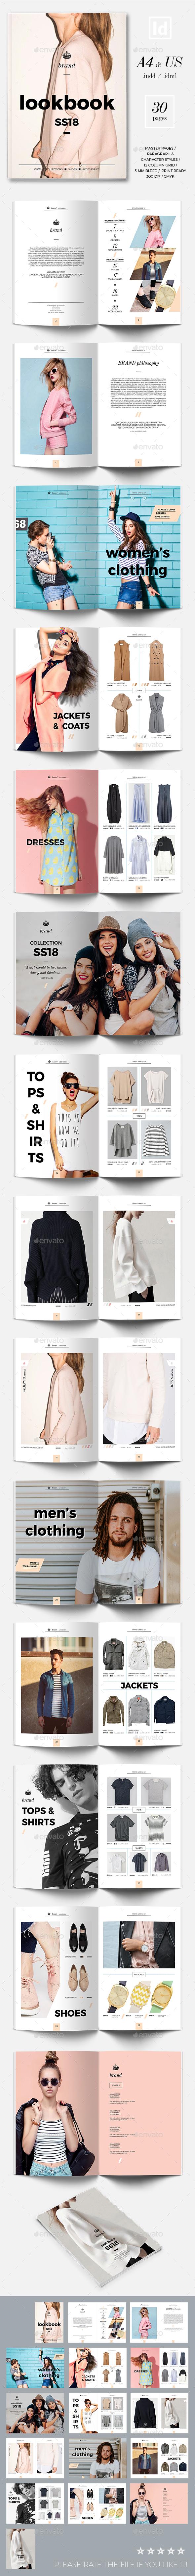 Lookbook 04 Template - Magazines Print Templates